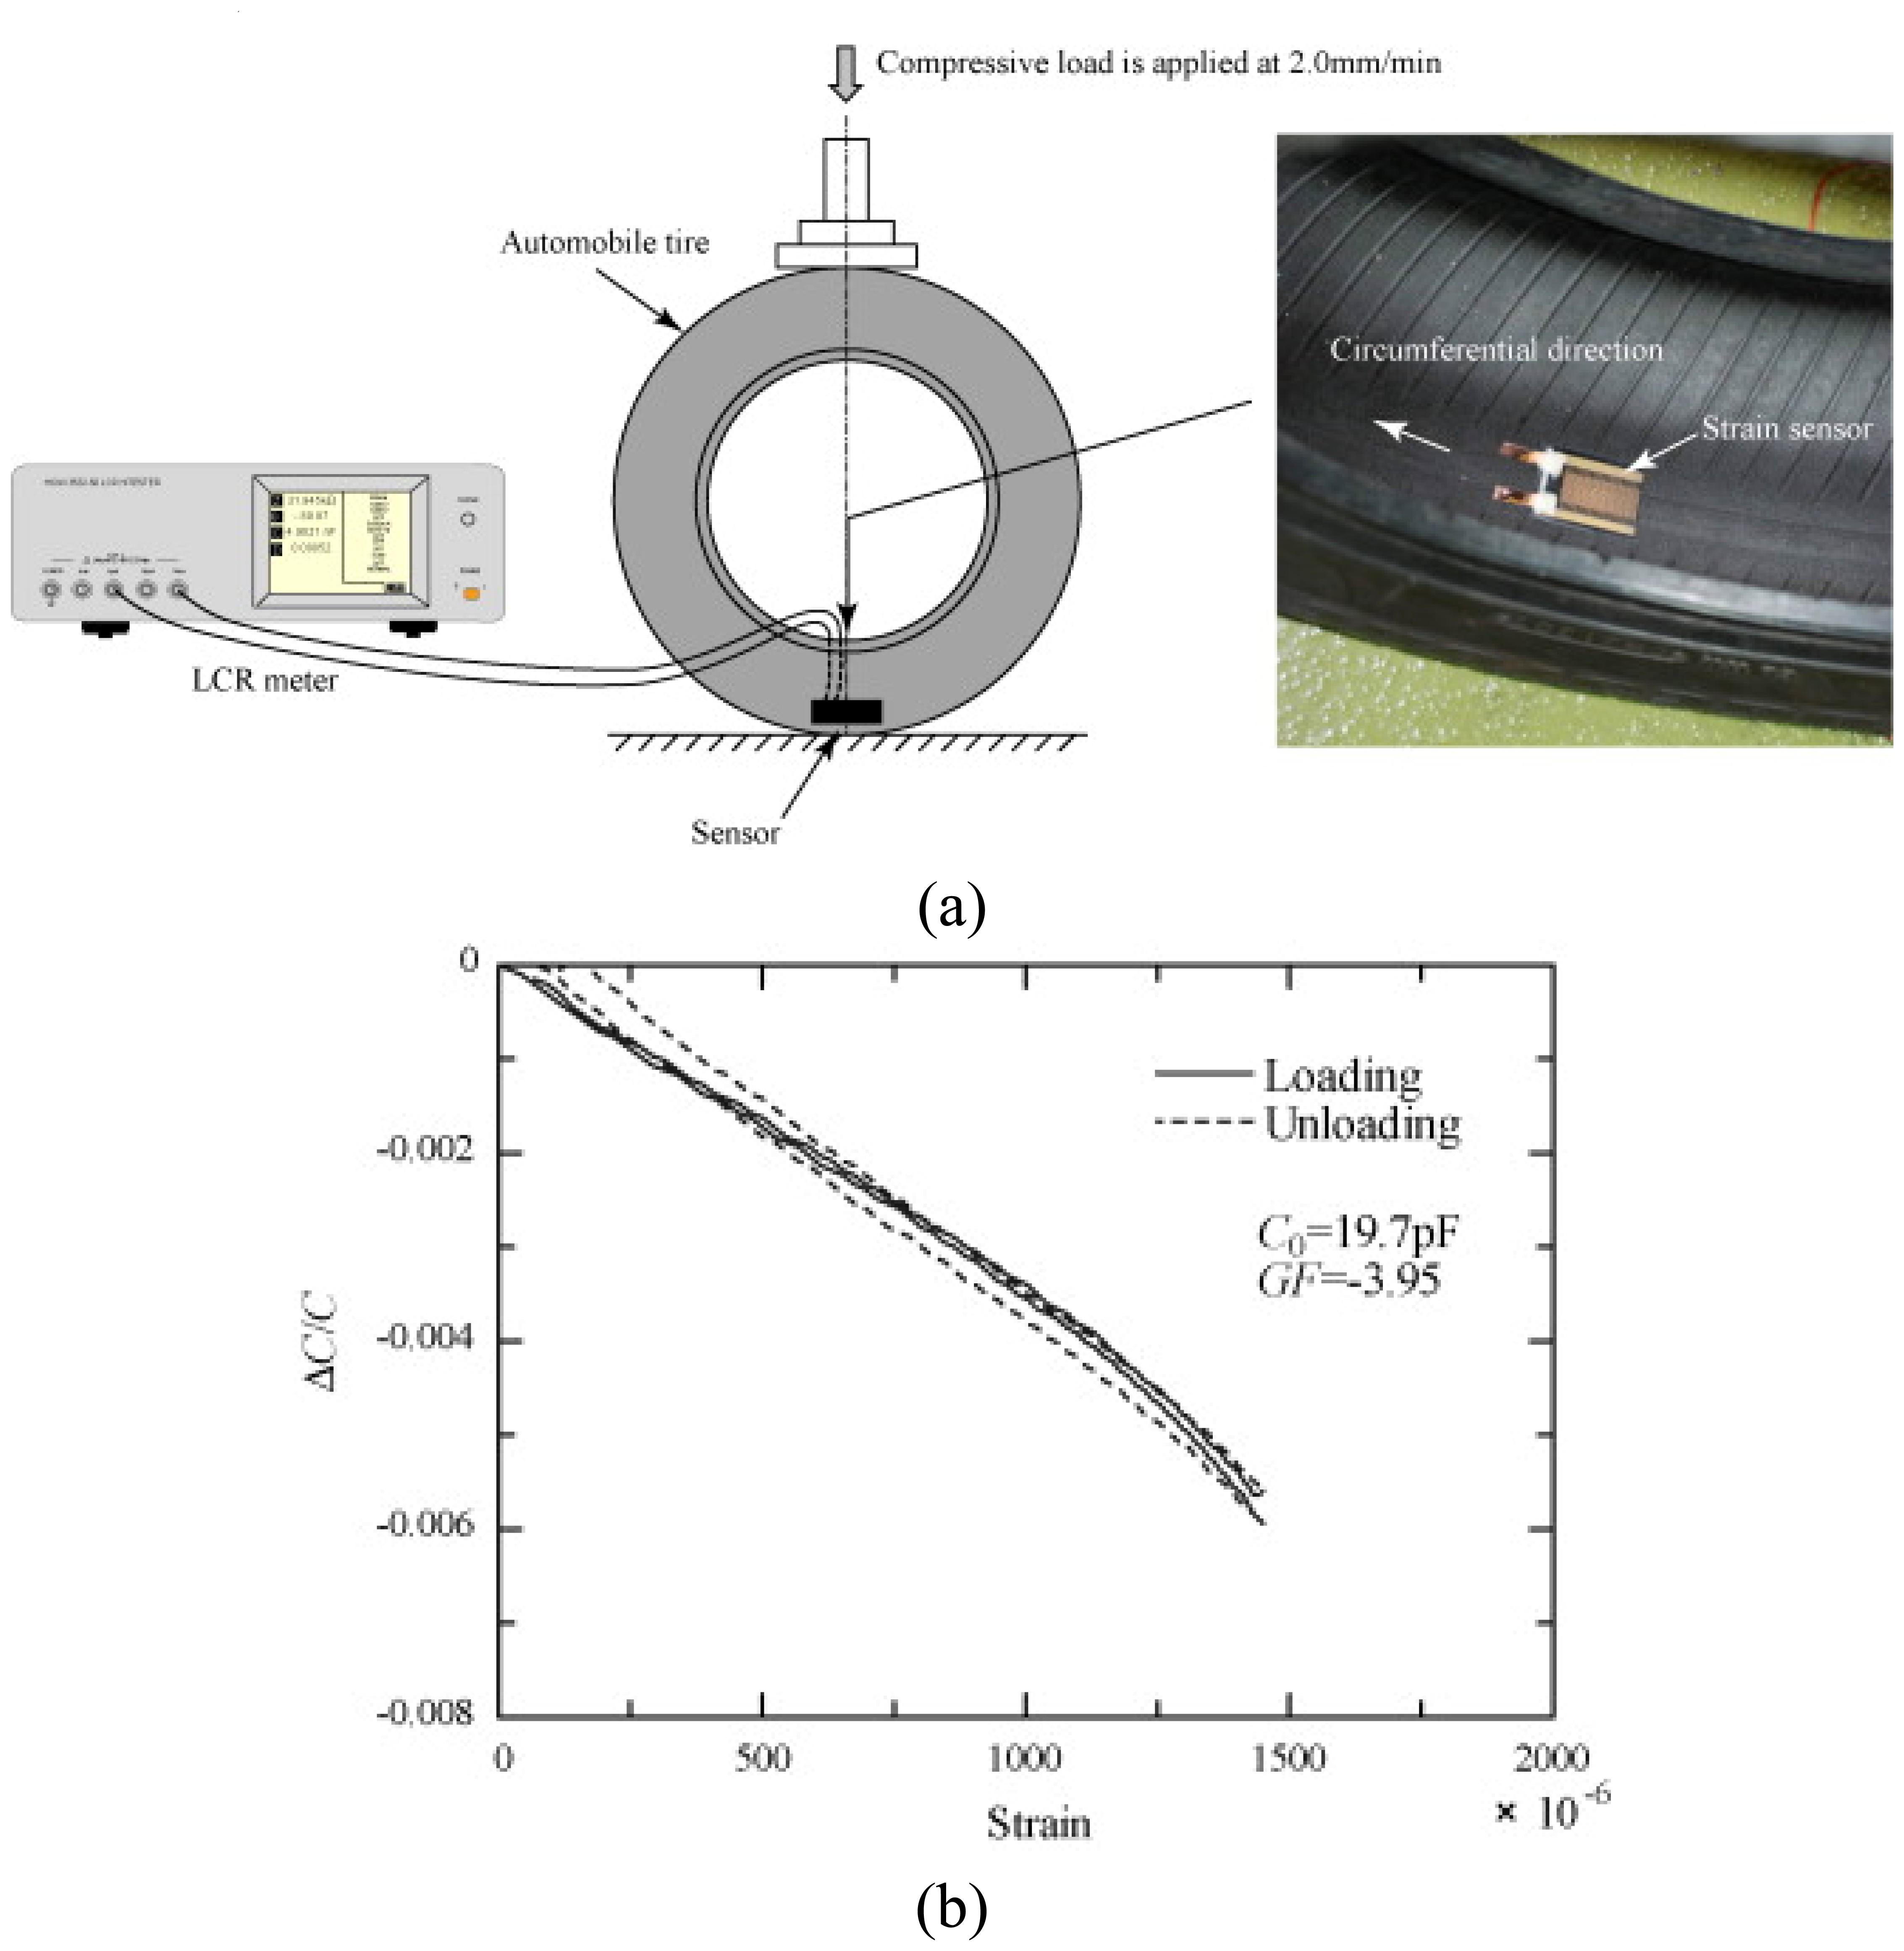 Radial Tire Rotation Diagram Sensors Free Full Text Of Radial Tire Rotation Diagram